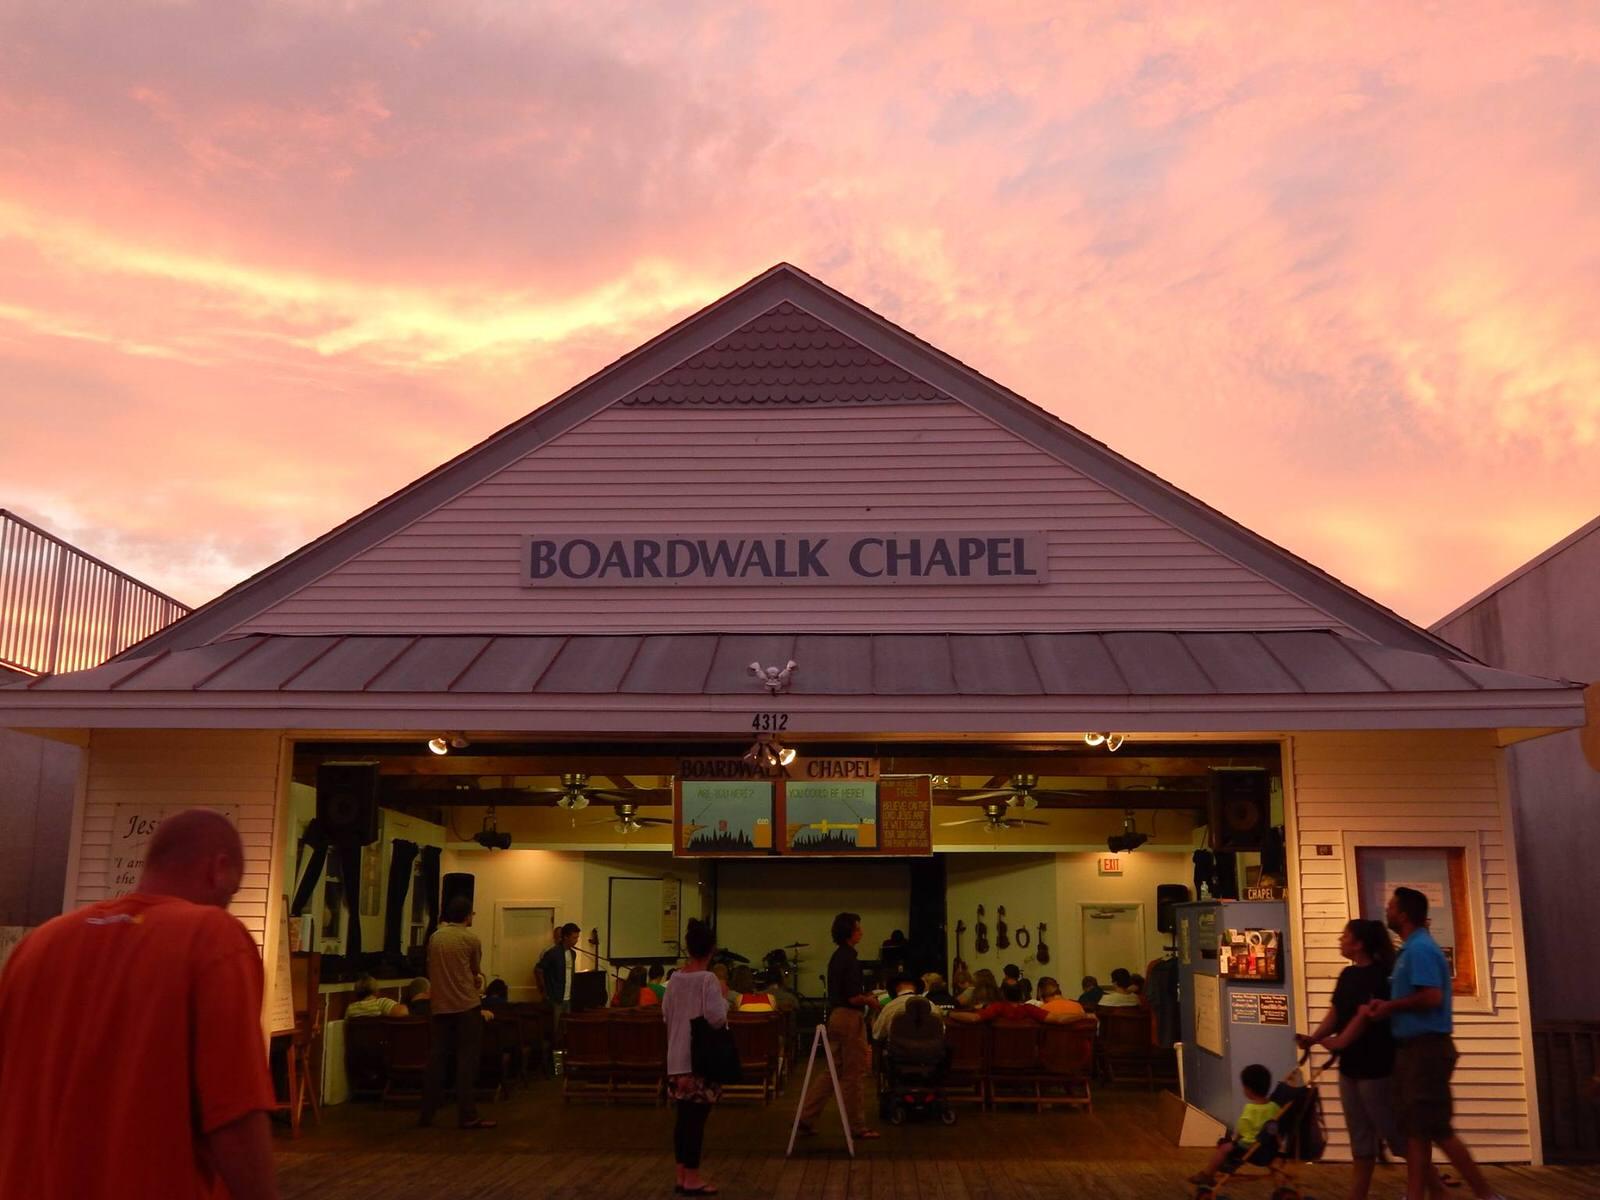 2016-06 Boardwalk chapel NH article photo 1